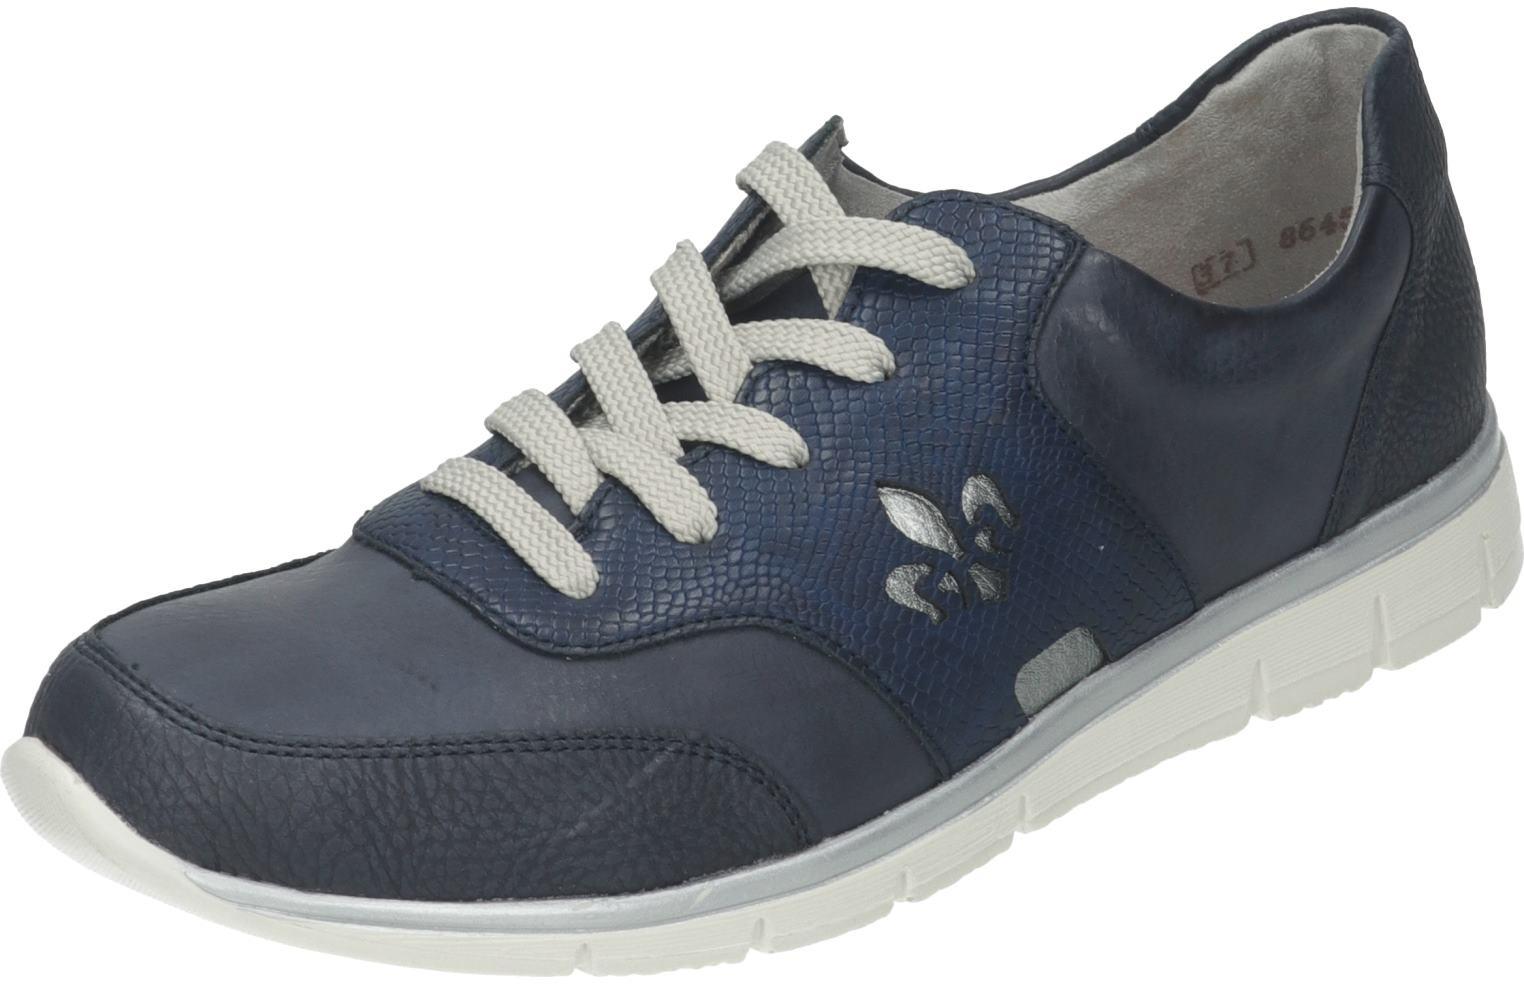 Rieker Damen Schuhe Damen-Schnürer blau Synthetik